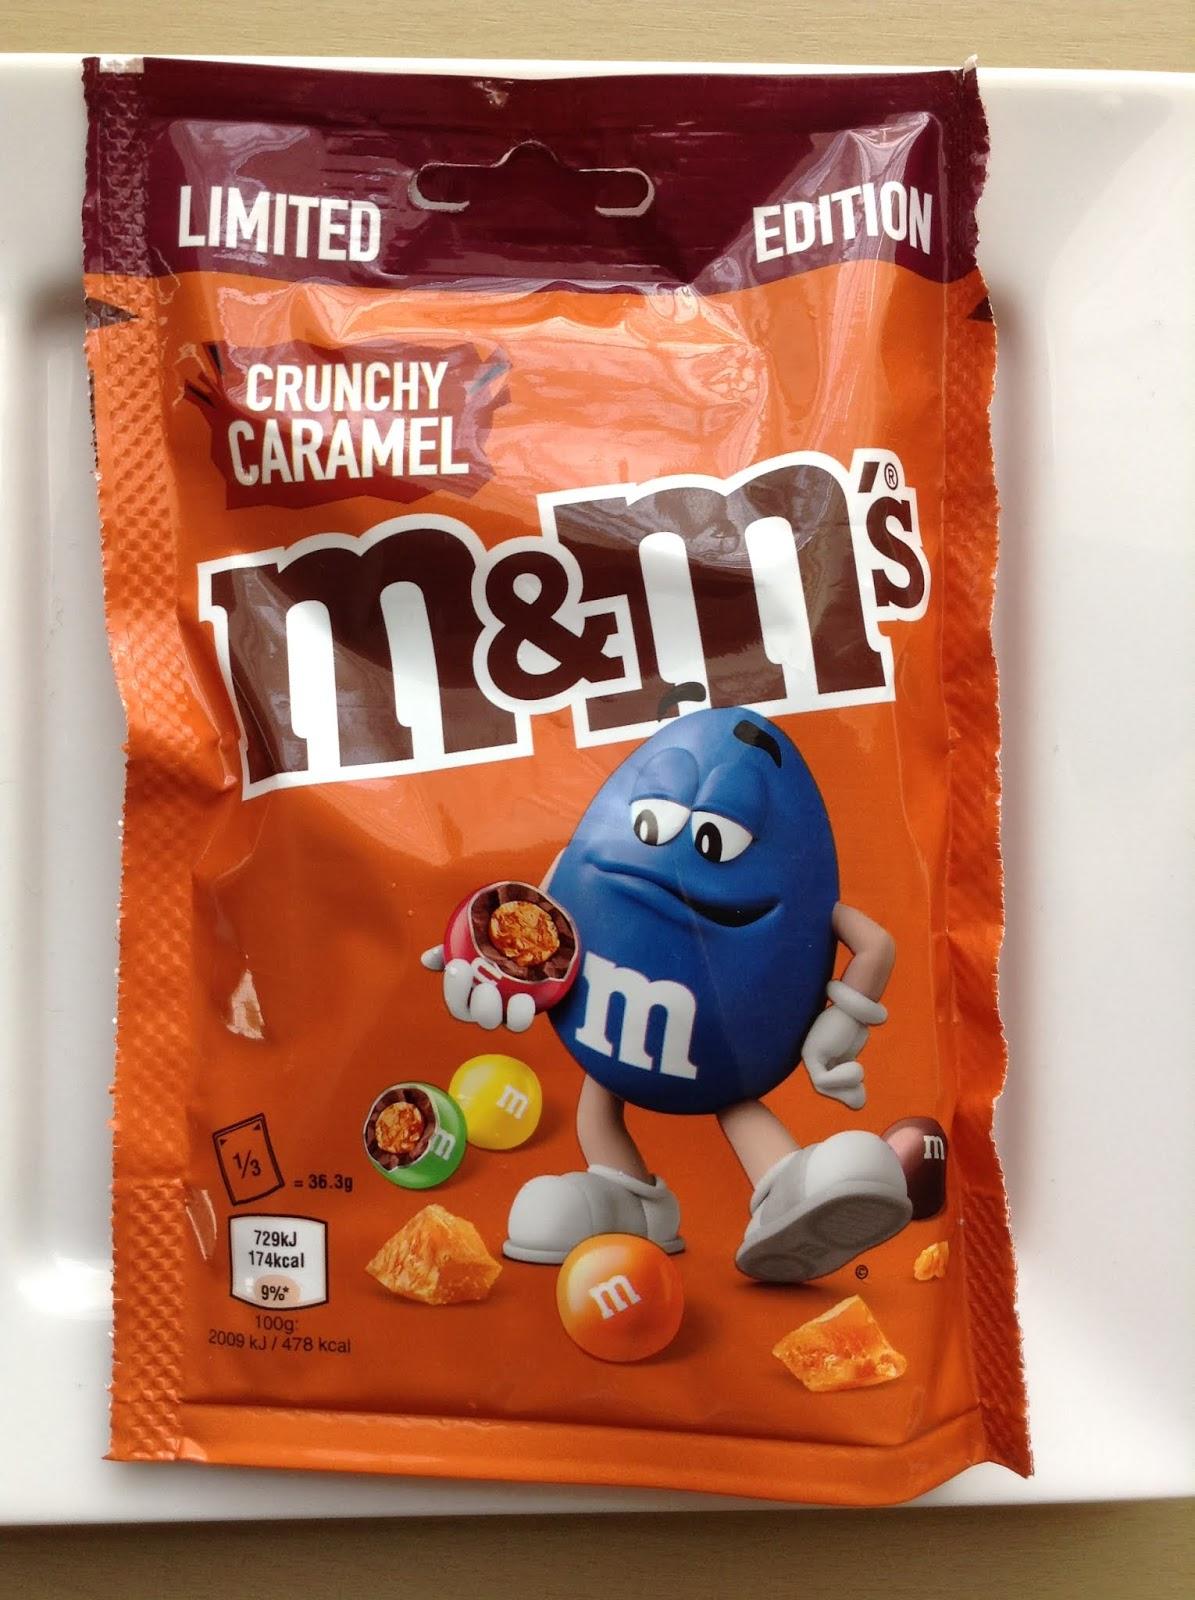 Limited Edition M&M's Crunchy Caramel sharing pouch (109g) £1 @ Asda